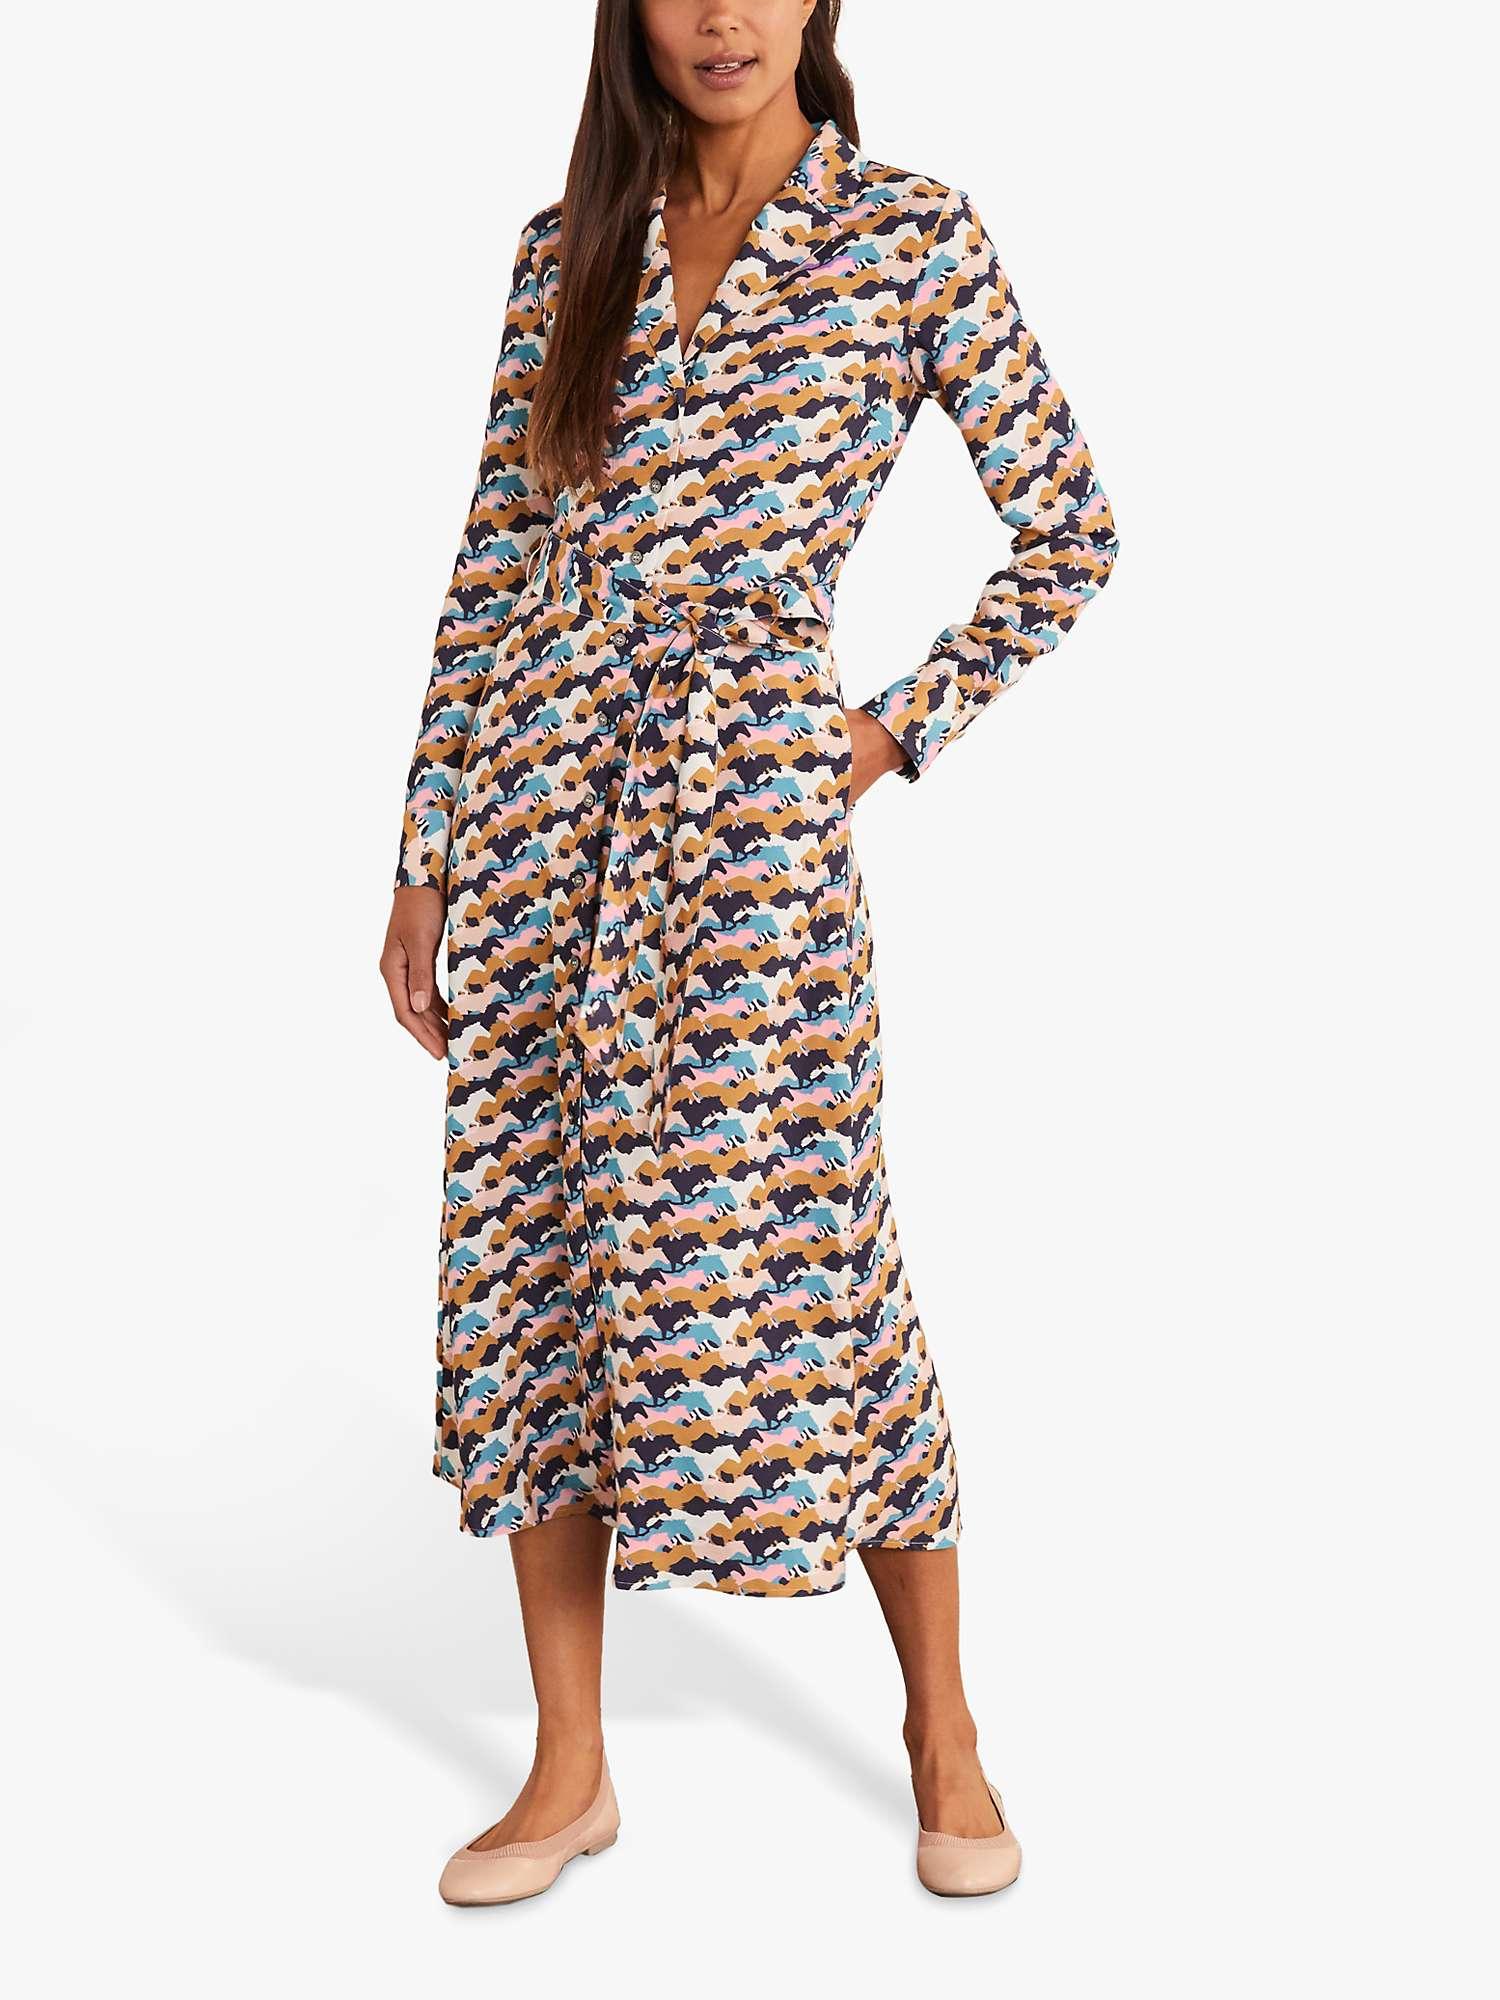 Boden Ottilie Horse Print Shirt Dress Navy At John Lewis Partners